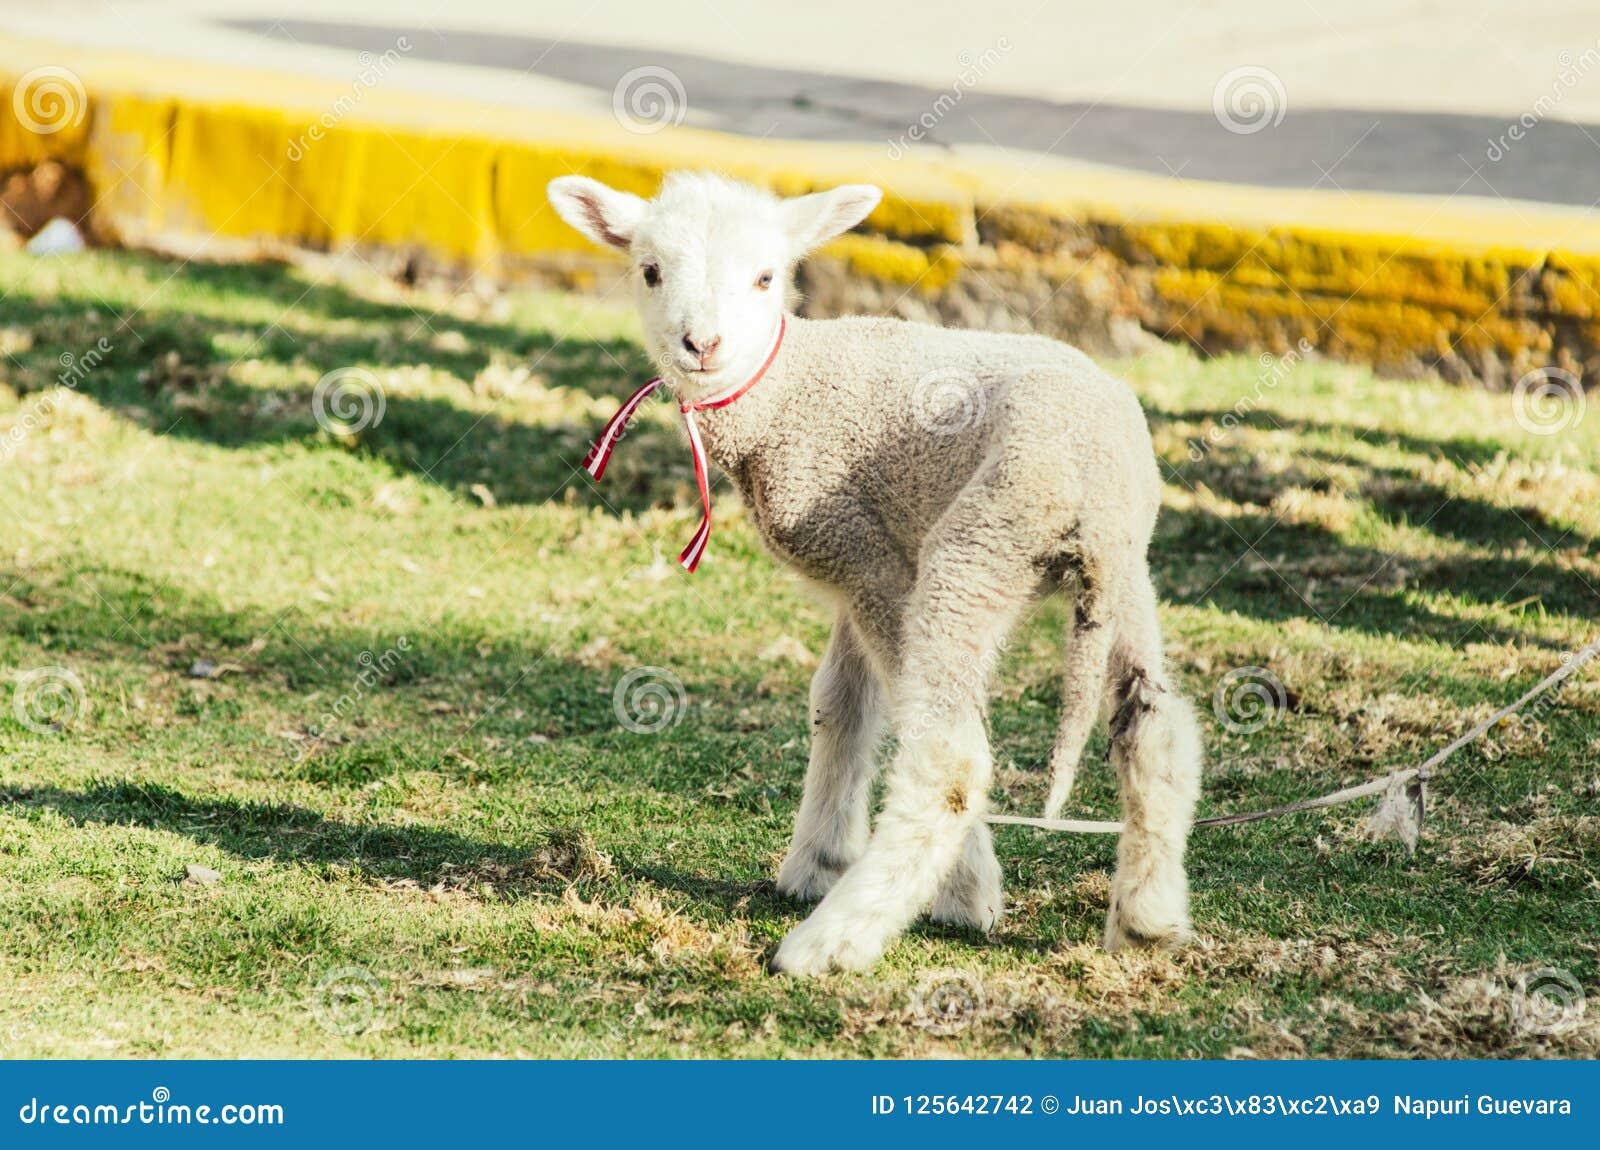 Small cute sheep gambolling in a meadow in a farm